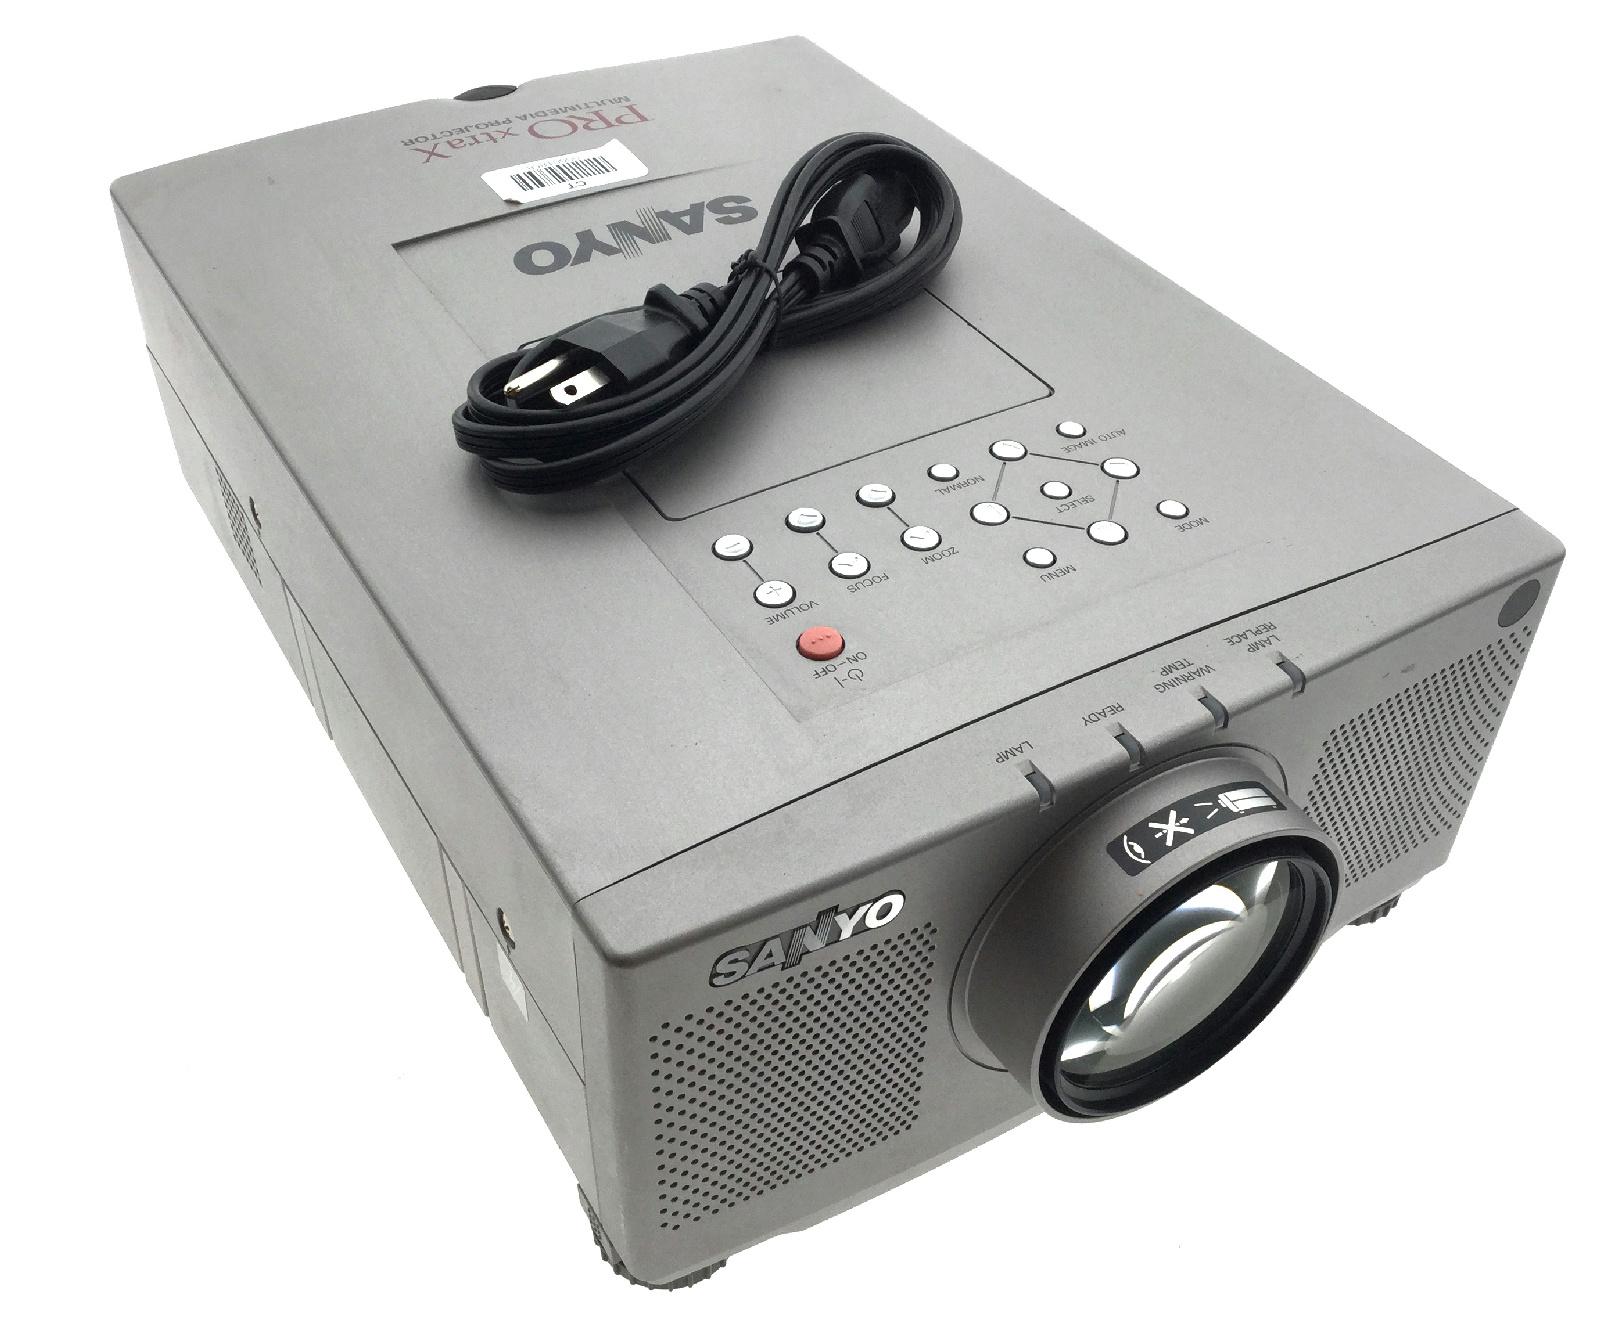 sanyo pro xtrax plc-xp17n lcd video projector